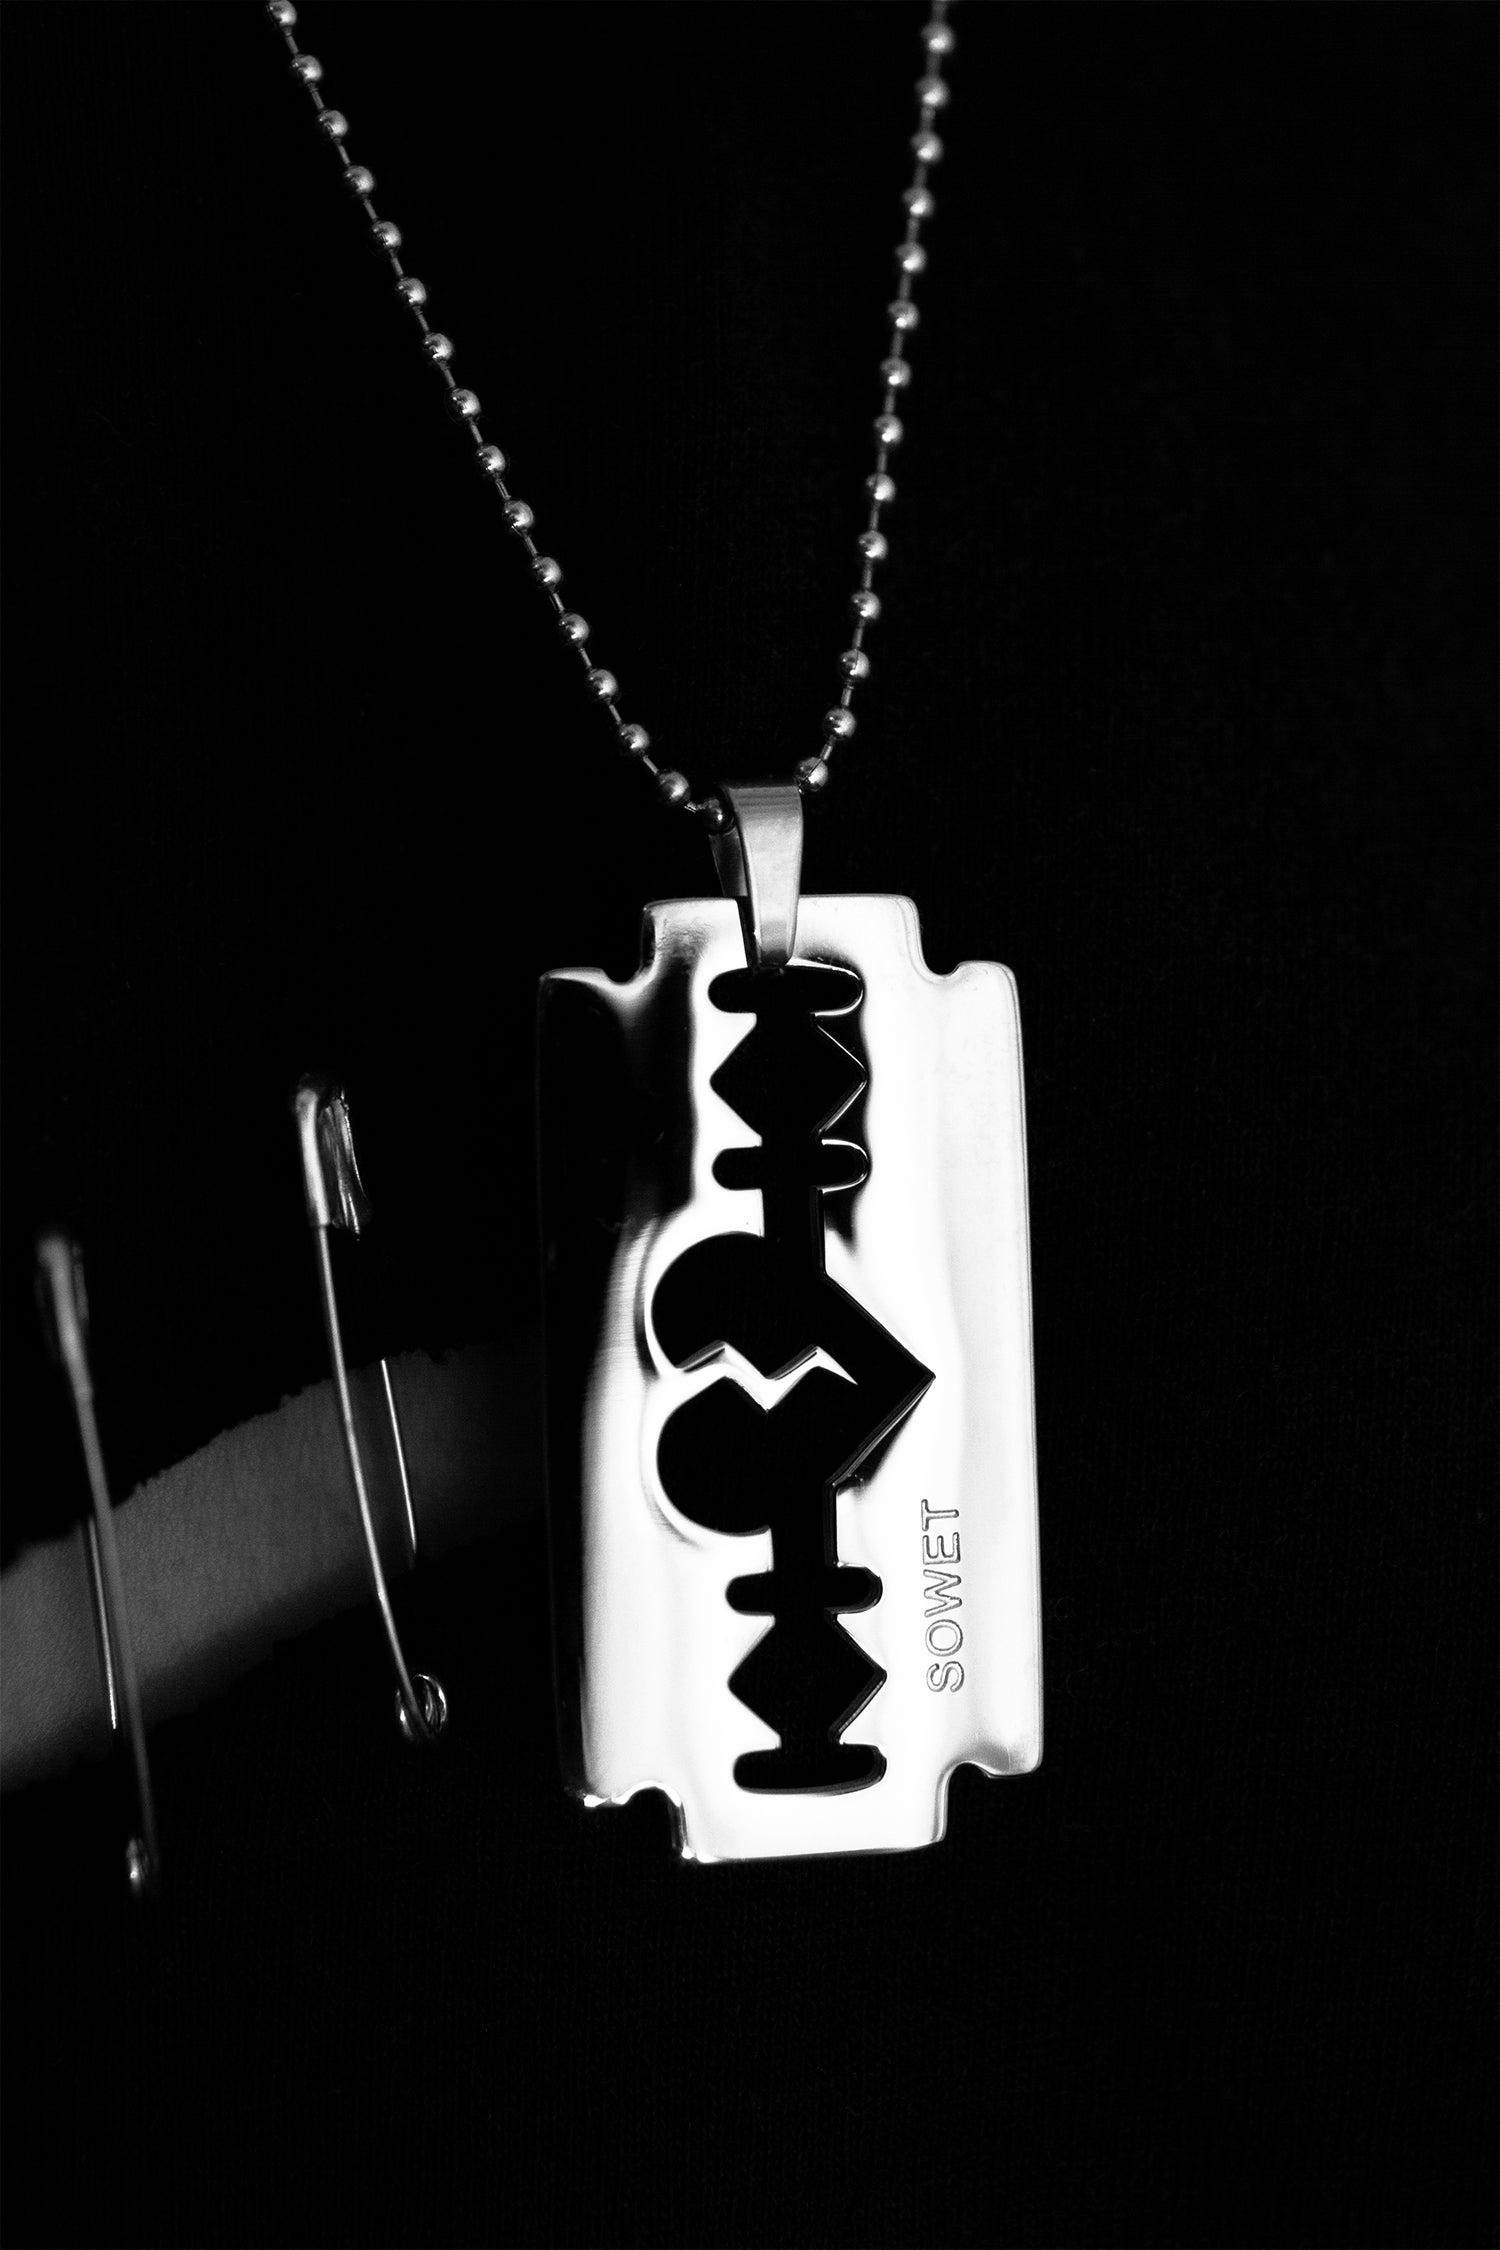 Image of Broken Necklace